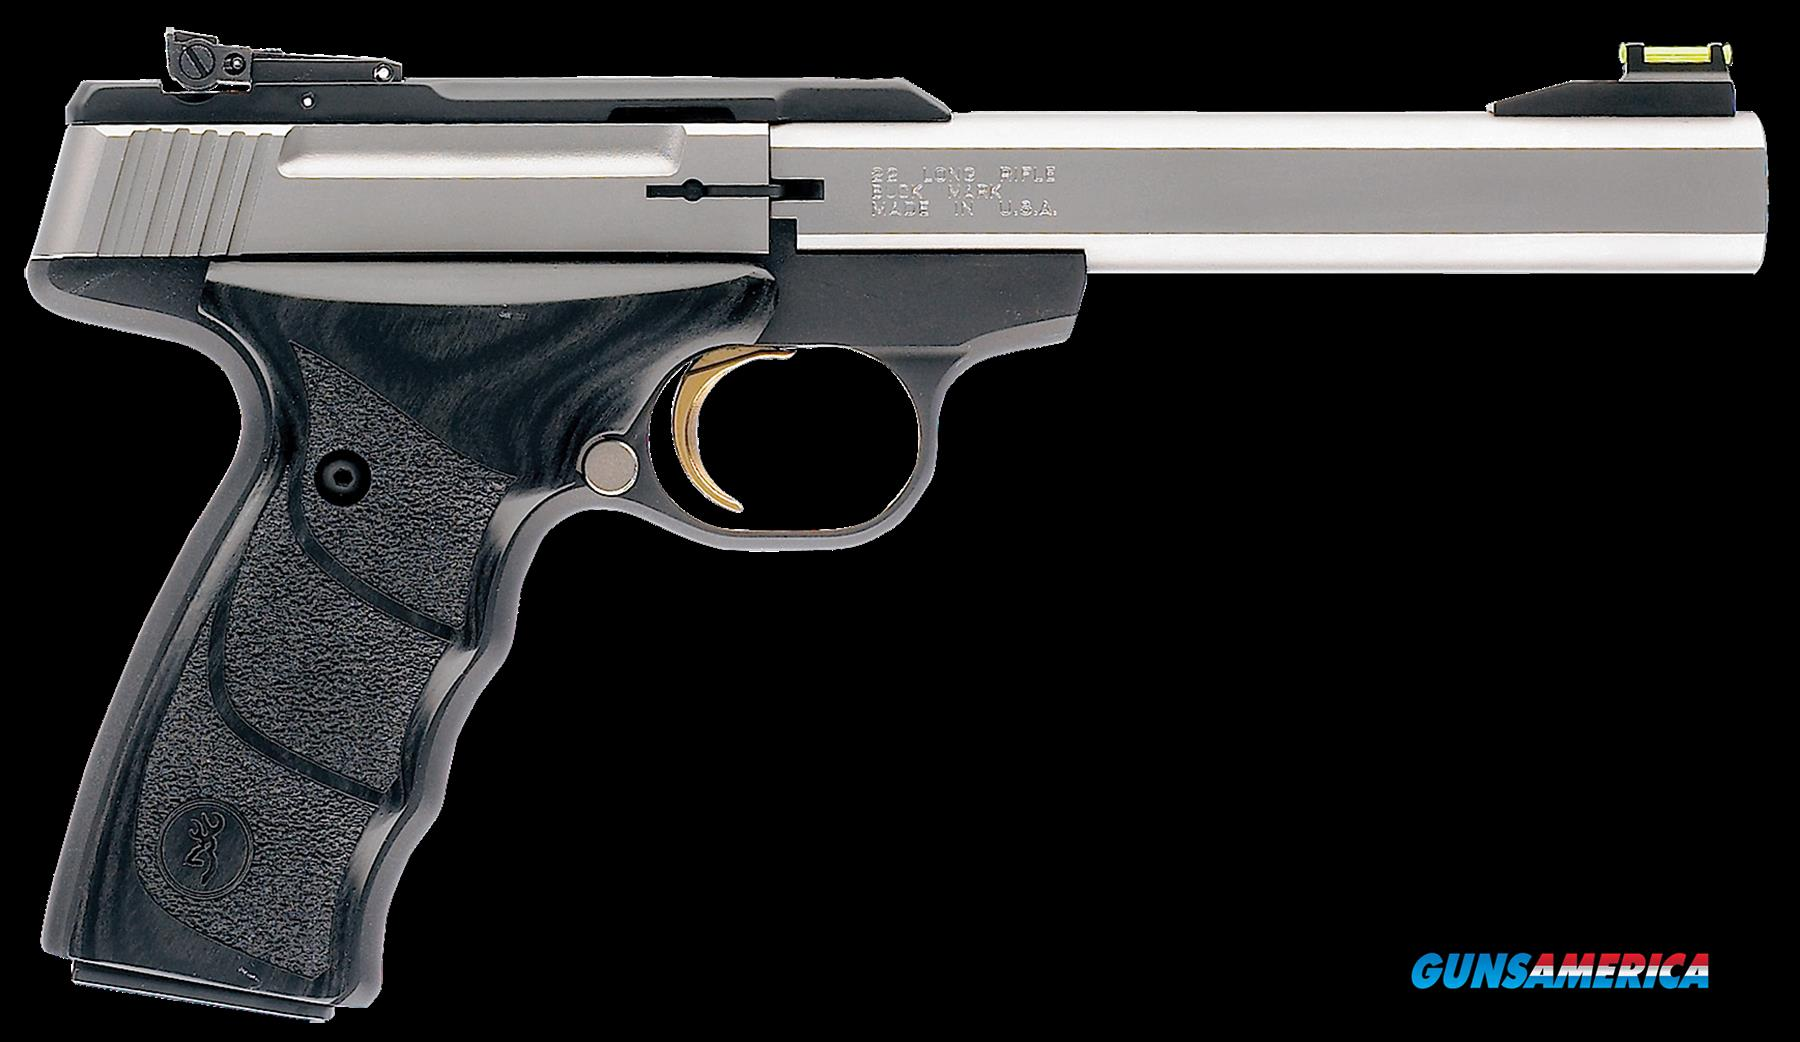 Browning Buck Mark, Brn 051-427490 Bkmk+22 Udx *ca* 5.5 Ss  Guns > Pistols > 1911 Pistol Copies (non-Colt)